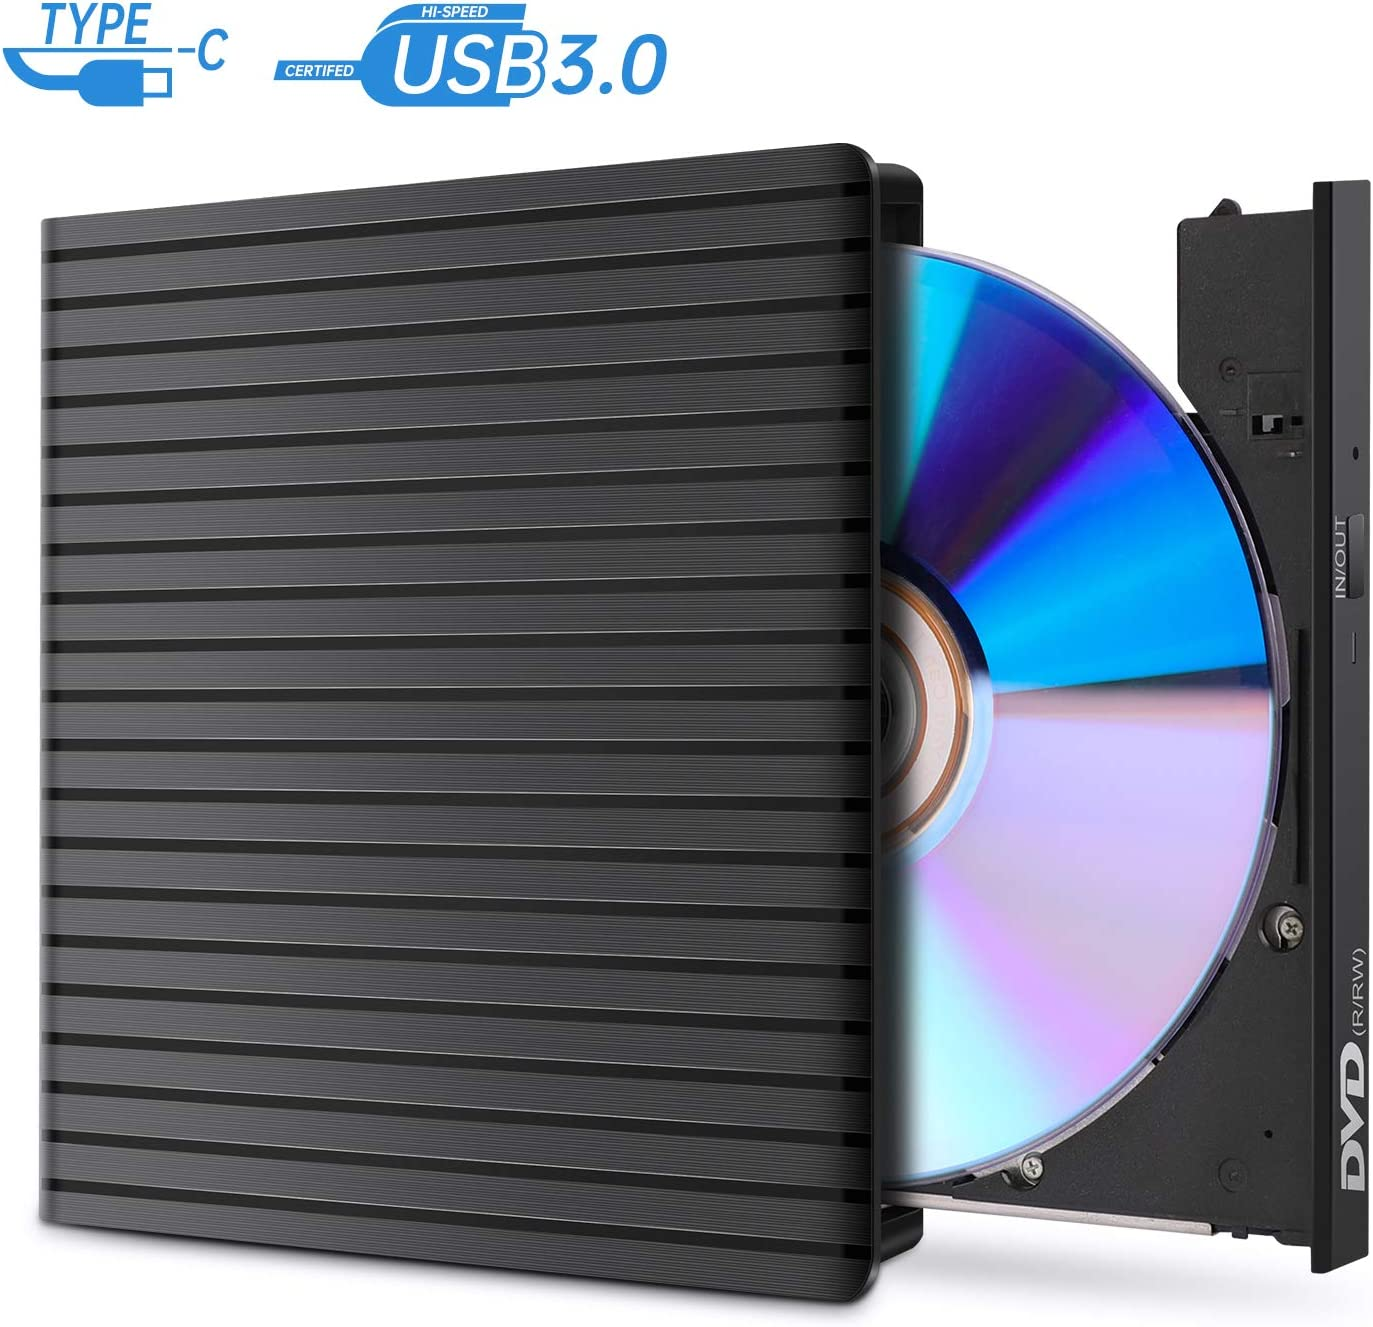 External CD DVD Drive, USB 3.0 and Type-C DVD Drive RW Optical CD Drive Reader Writer Burner for PC Laptop Desktop Mac Windows Linux